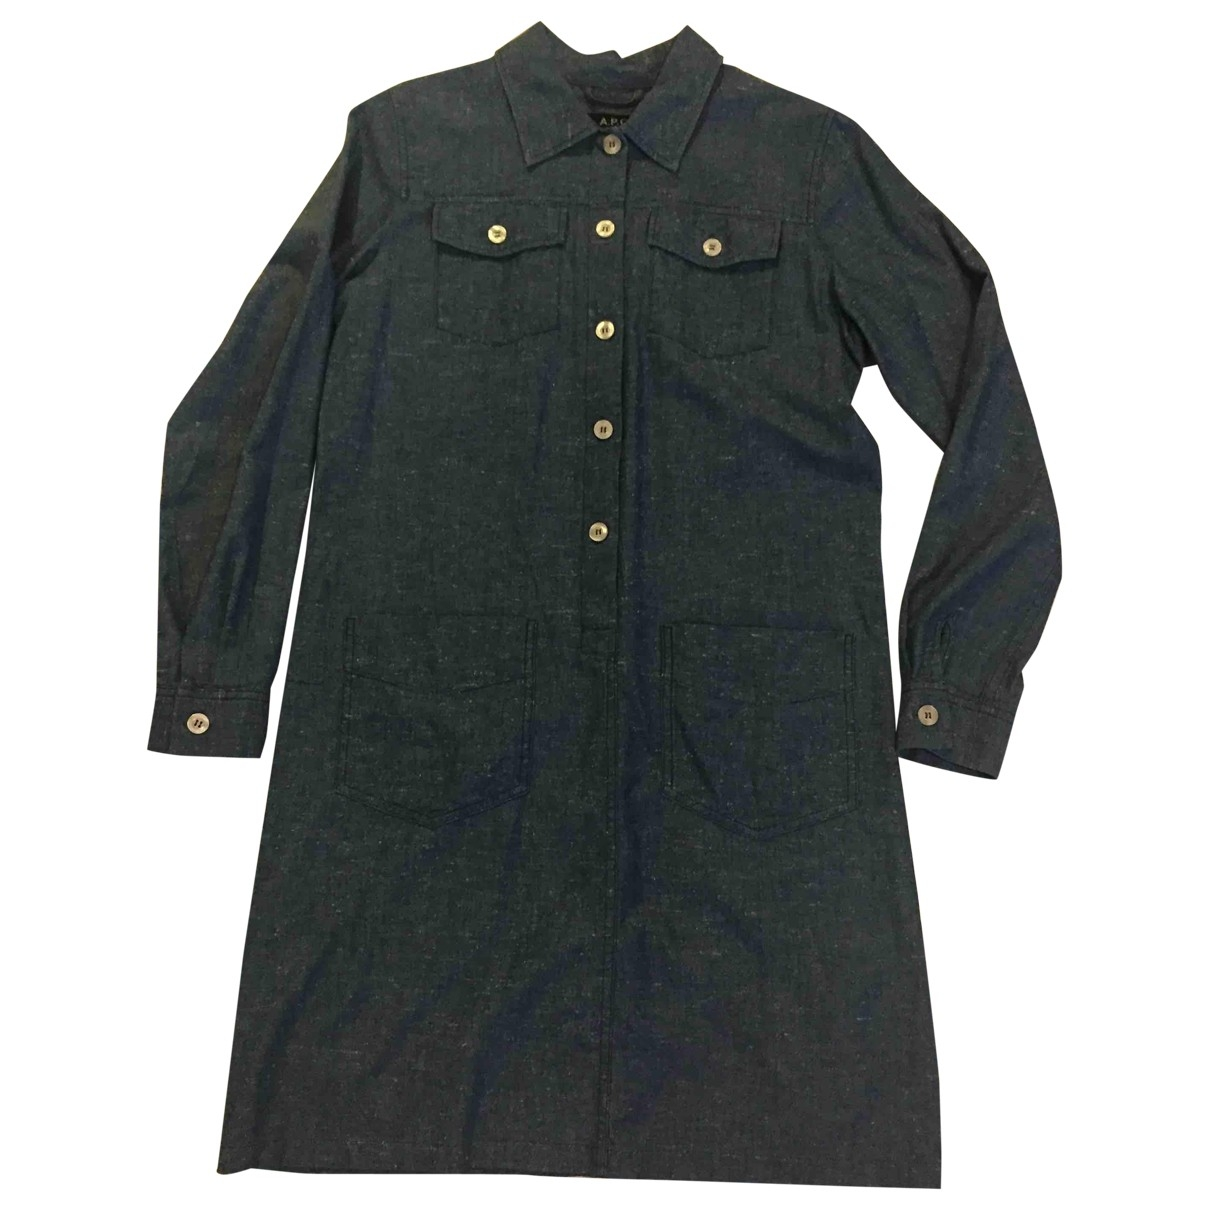 Apc \N Blue Cotton dress for Women 36 FR